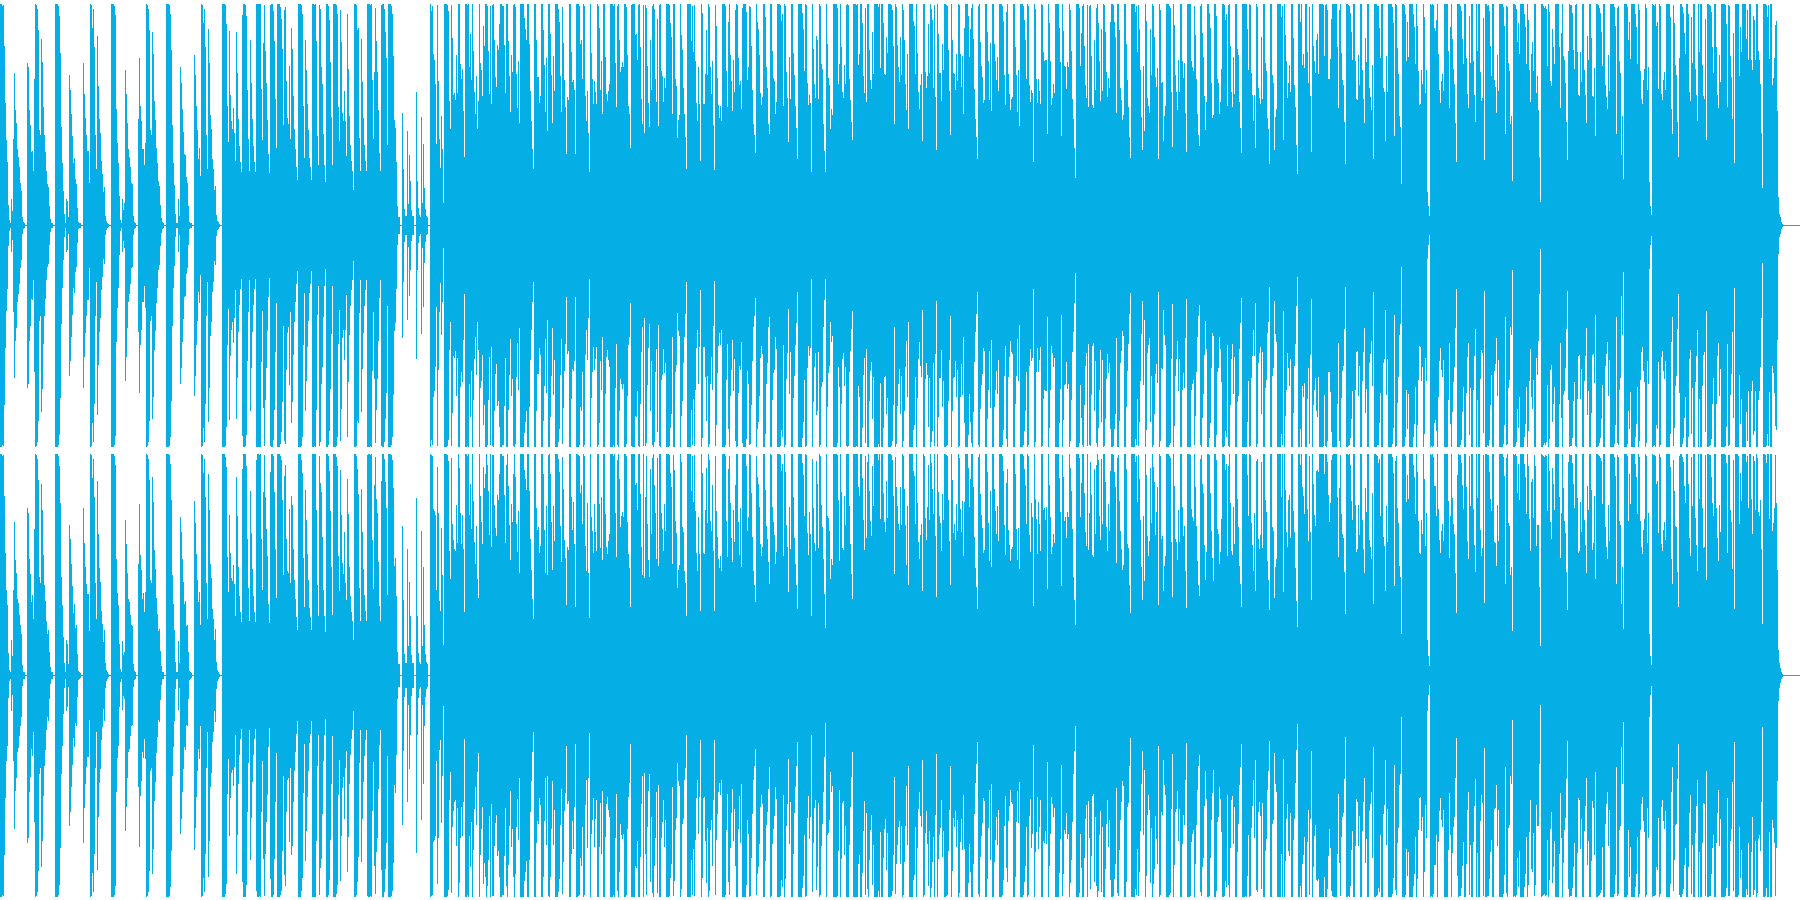 3xoscシンセのみで作曲したテクノの再生済みの波形